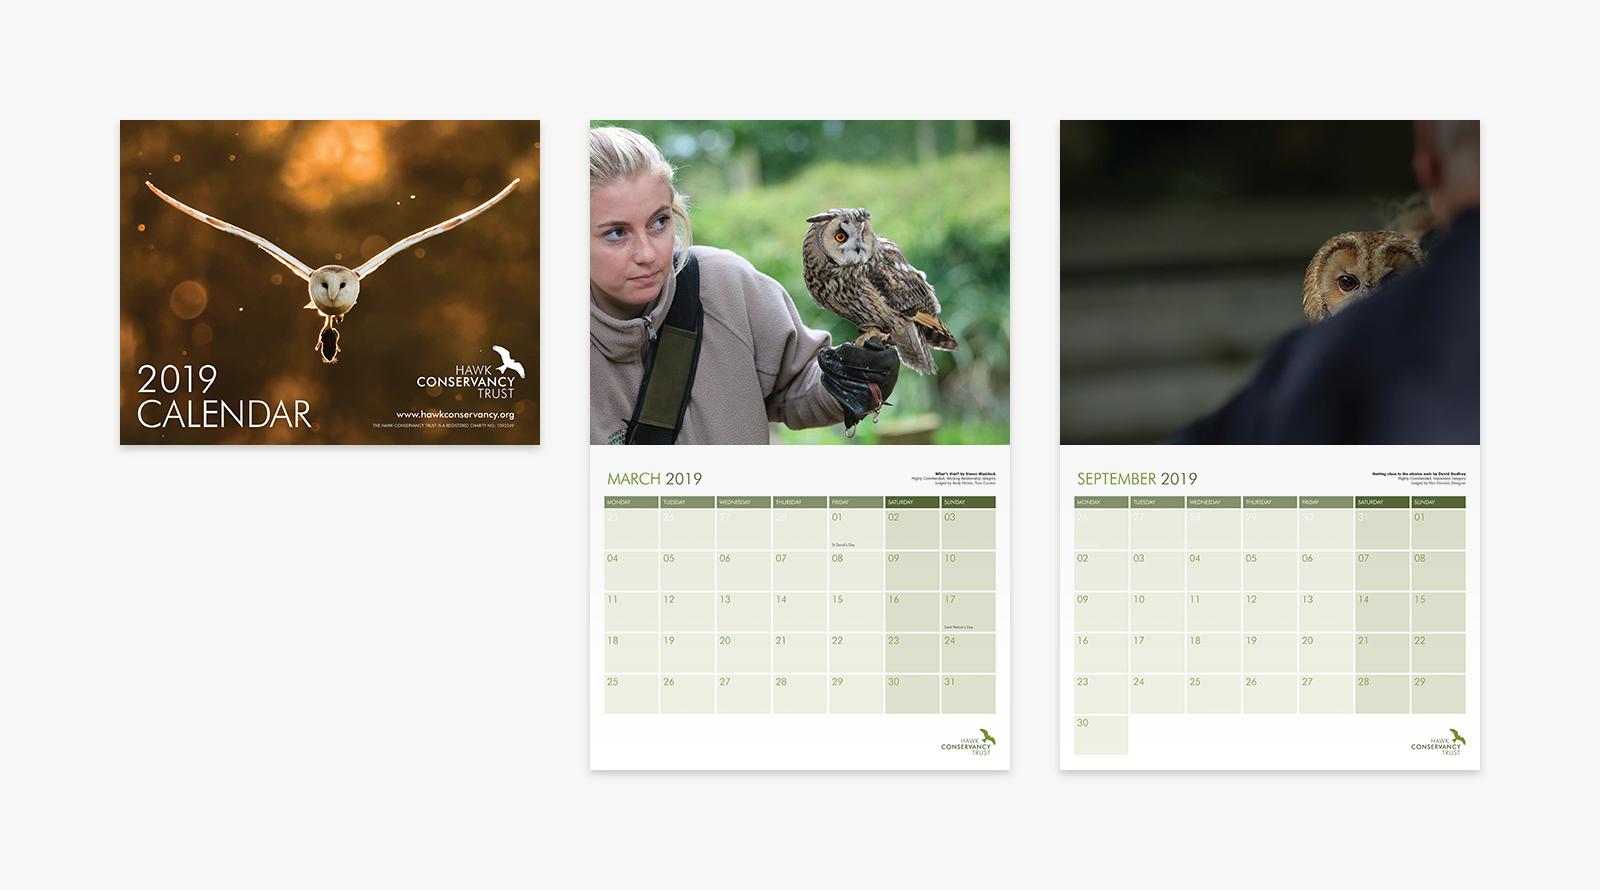 HCT_2019_calendar_mockup